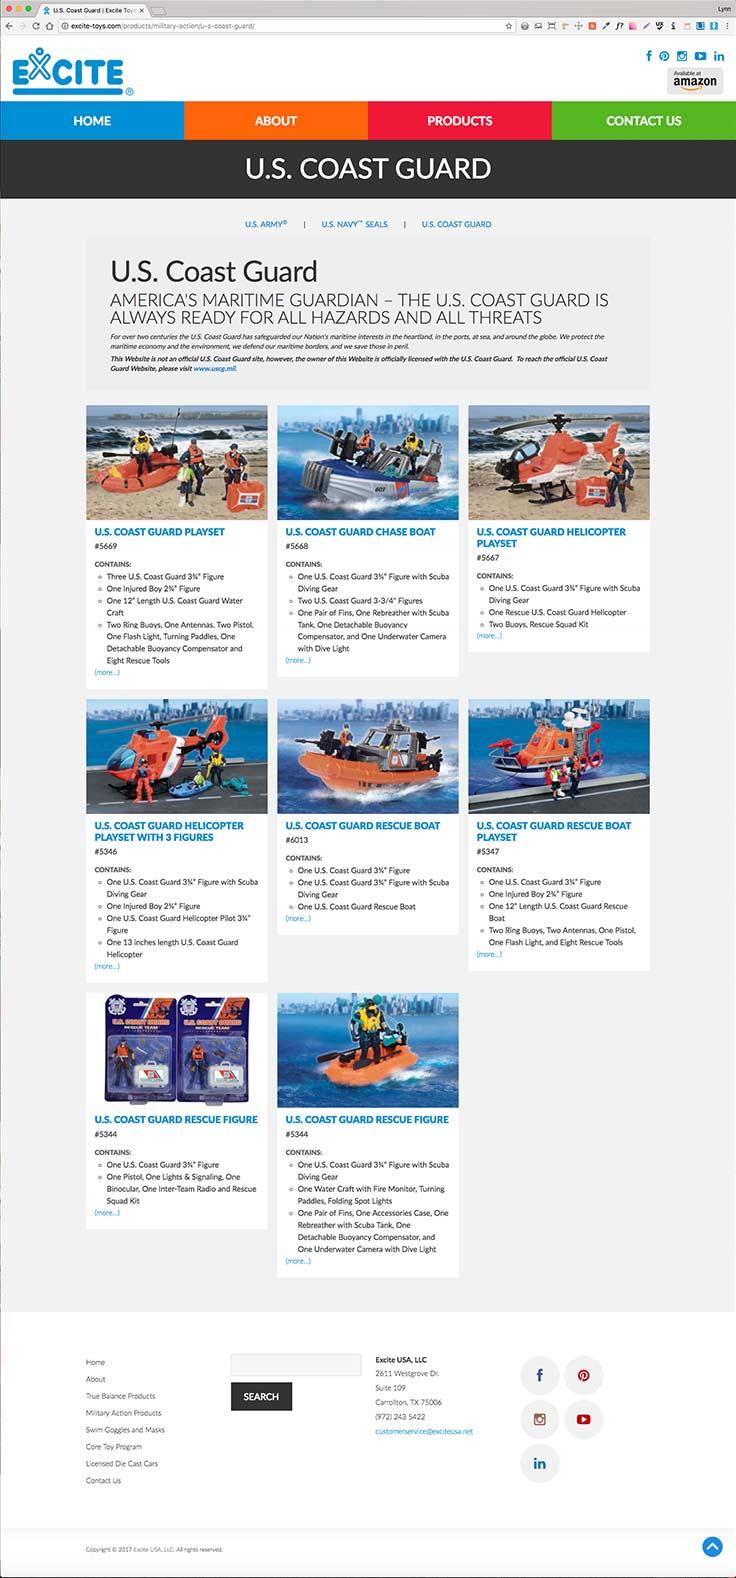 Excite-Toys website screenshots